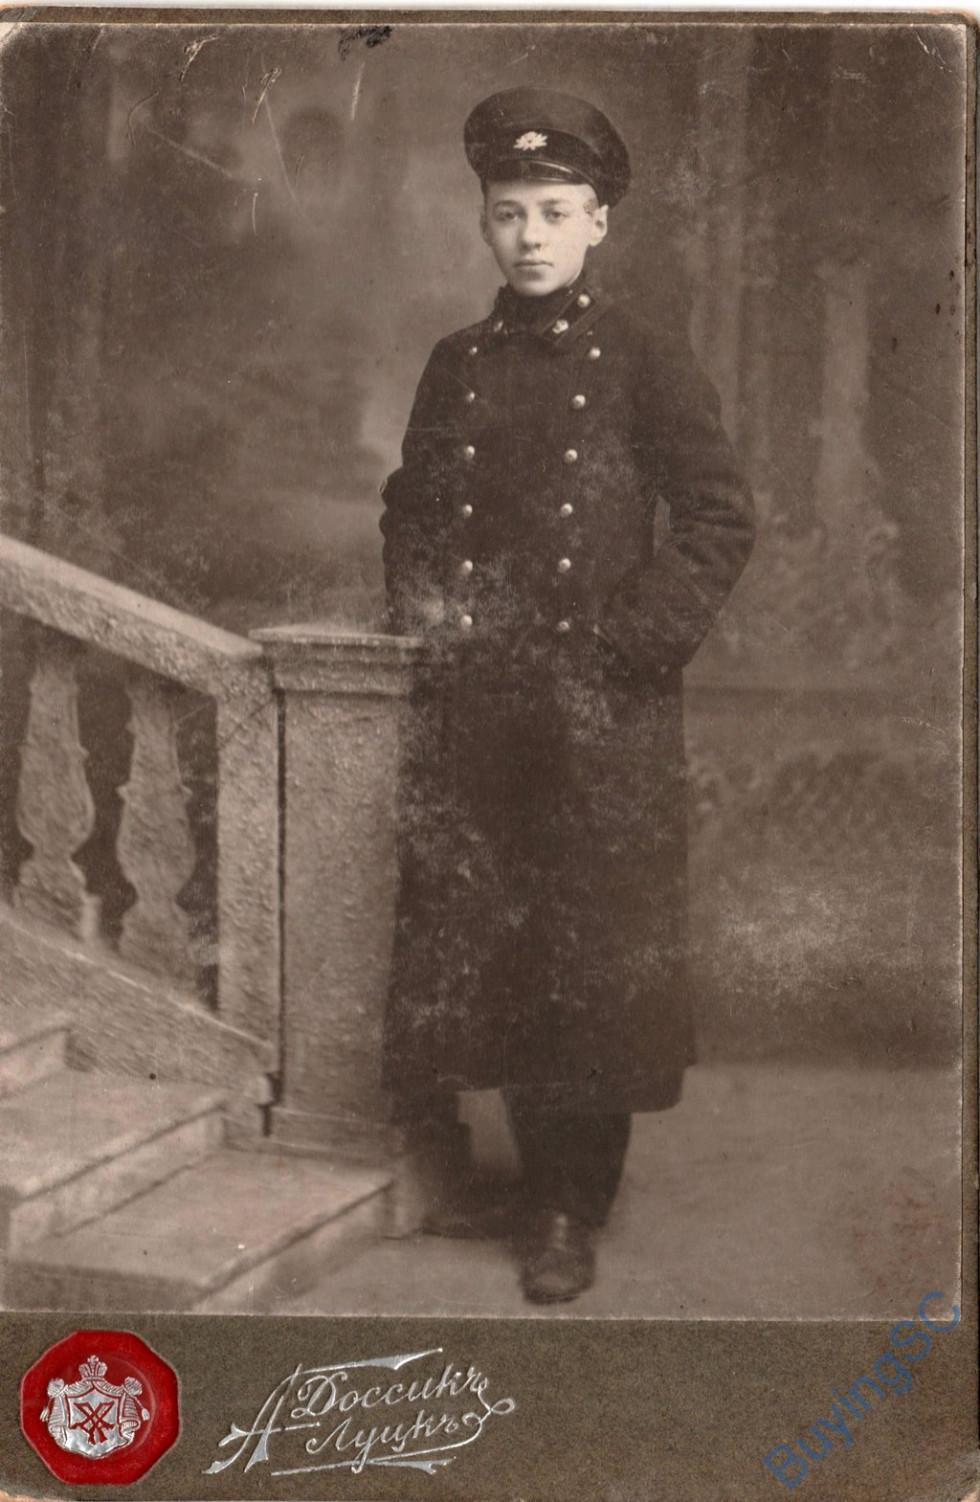 Портрет хлопця. Фотосалон «Доссикь», початок ХХ ст.